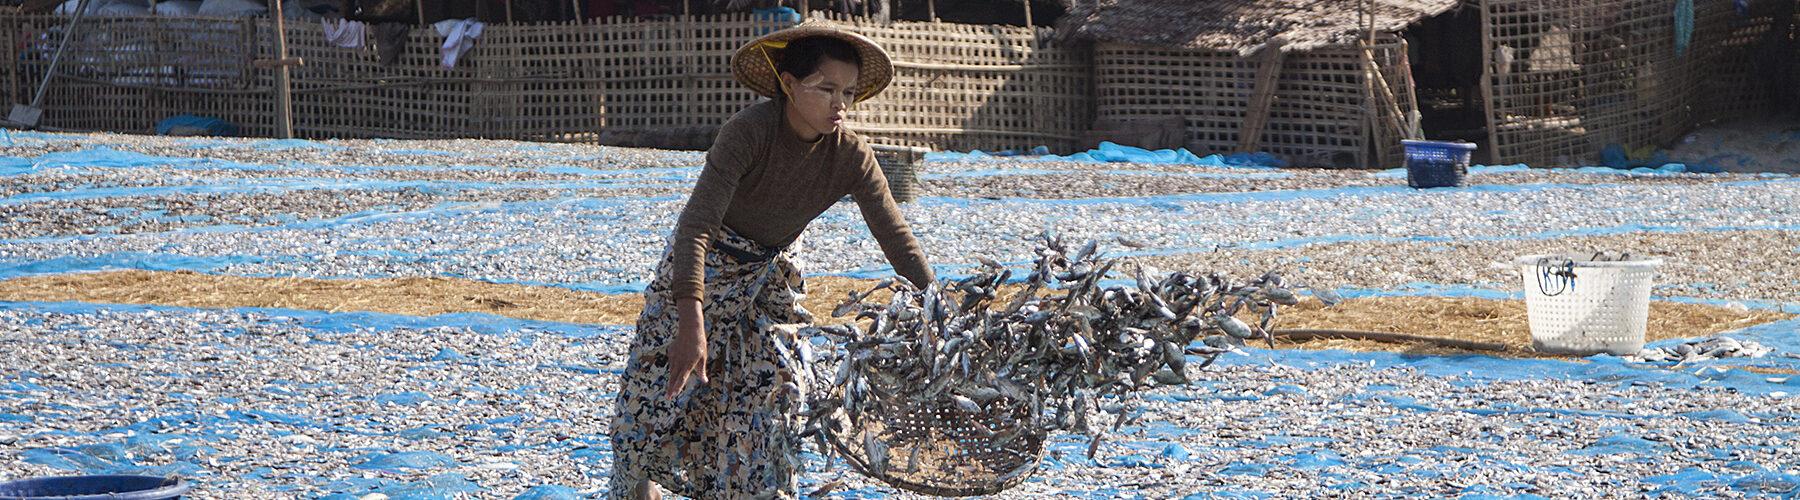 Ngapali fisherman